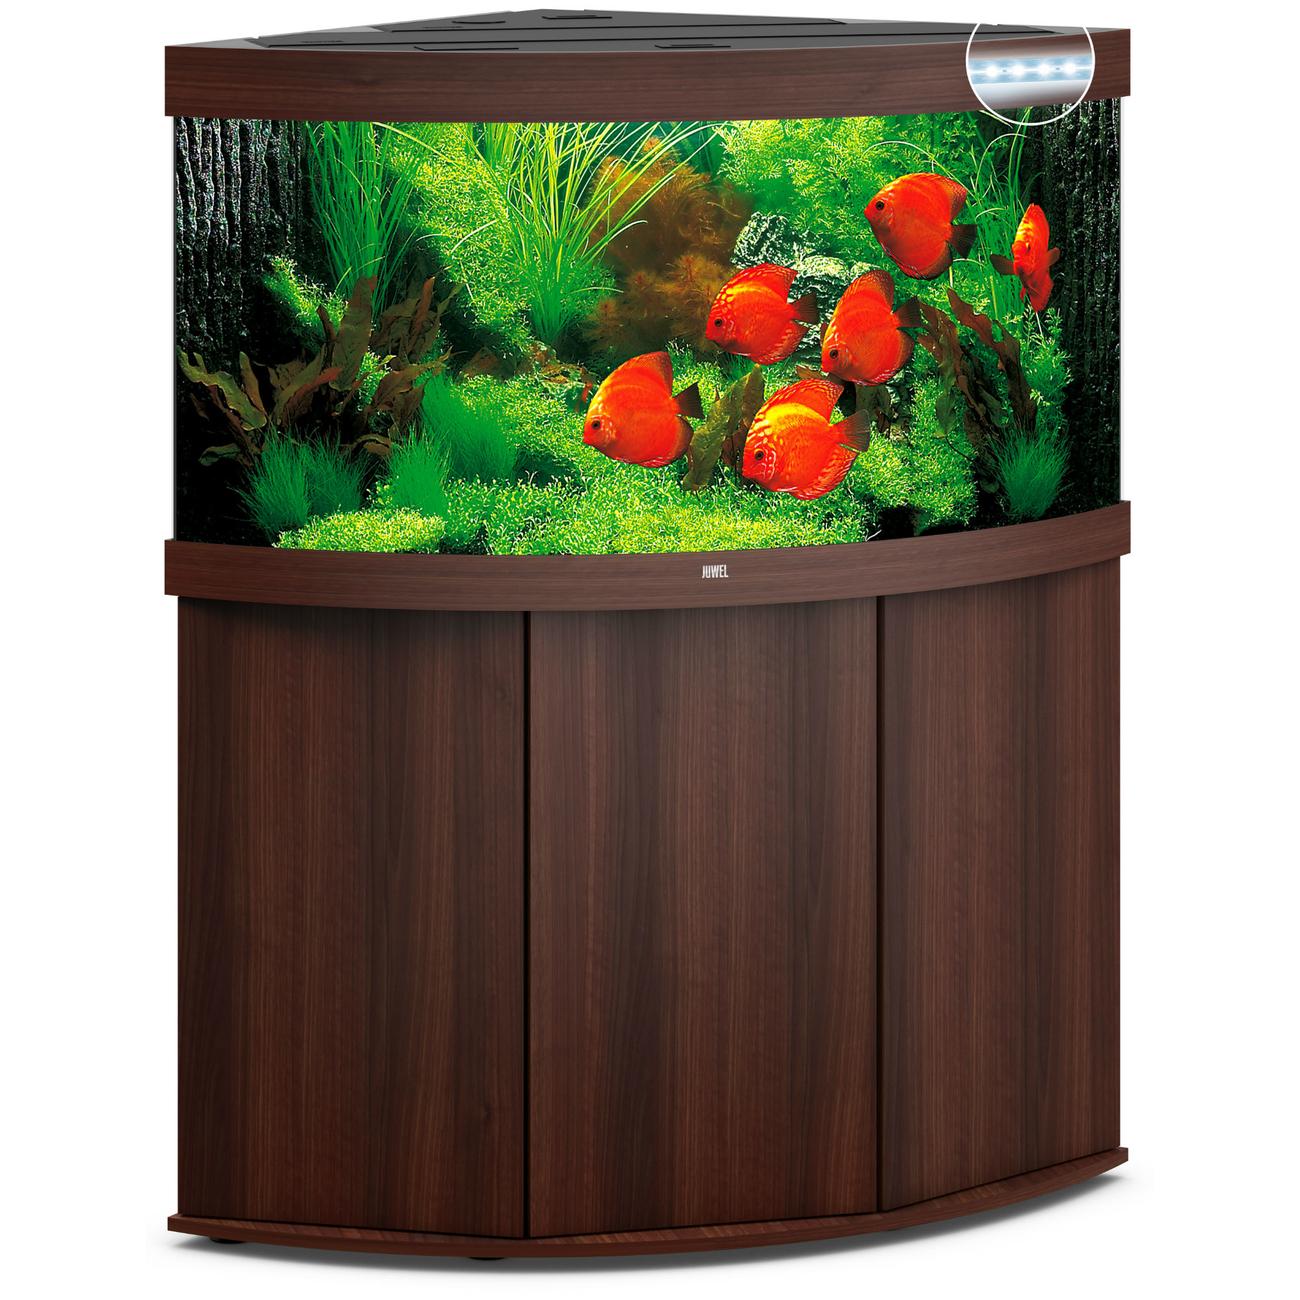 Juwel Trigon 350 LED Eck-Aquarium mit Unterschrank, Bild 15